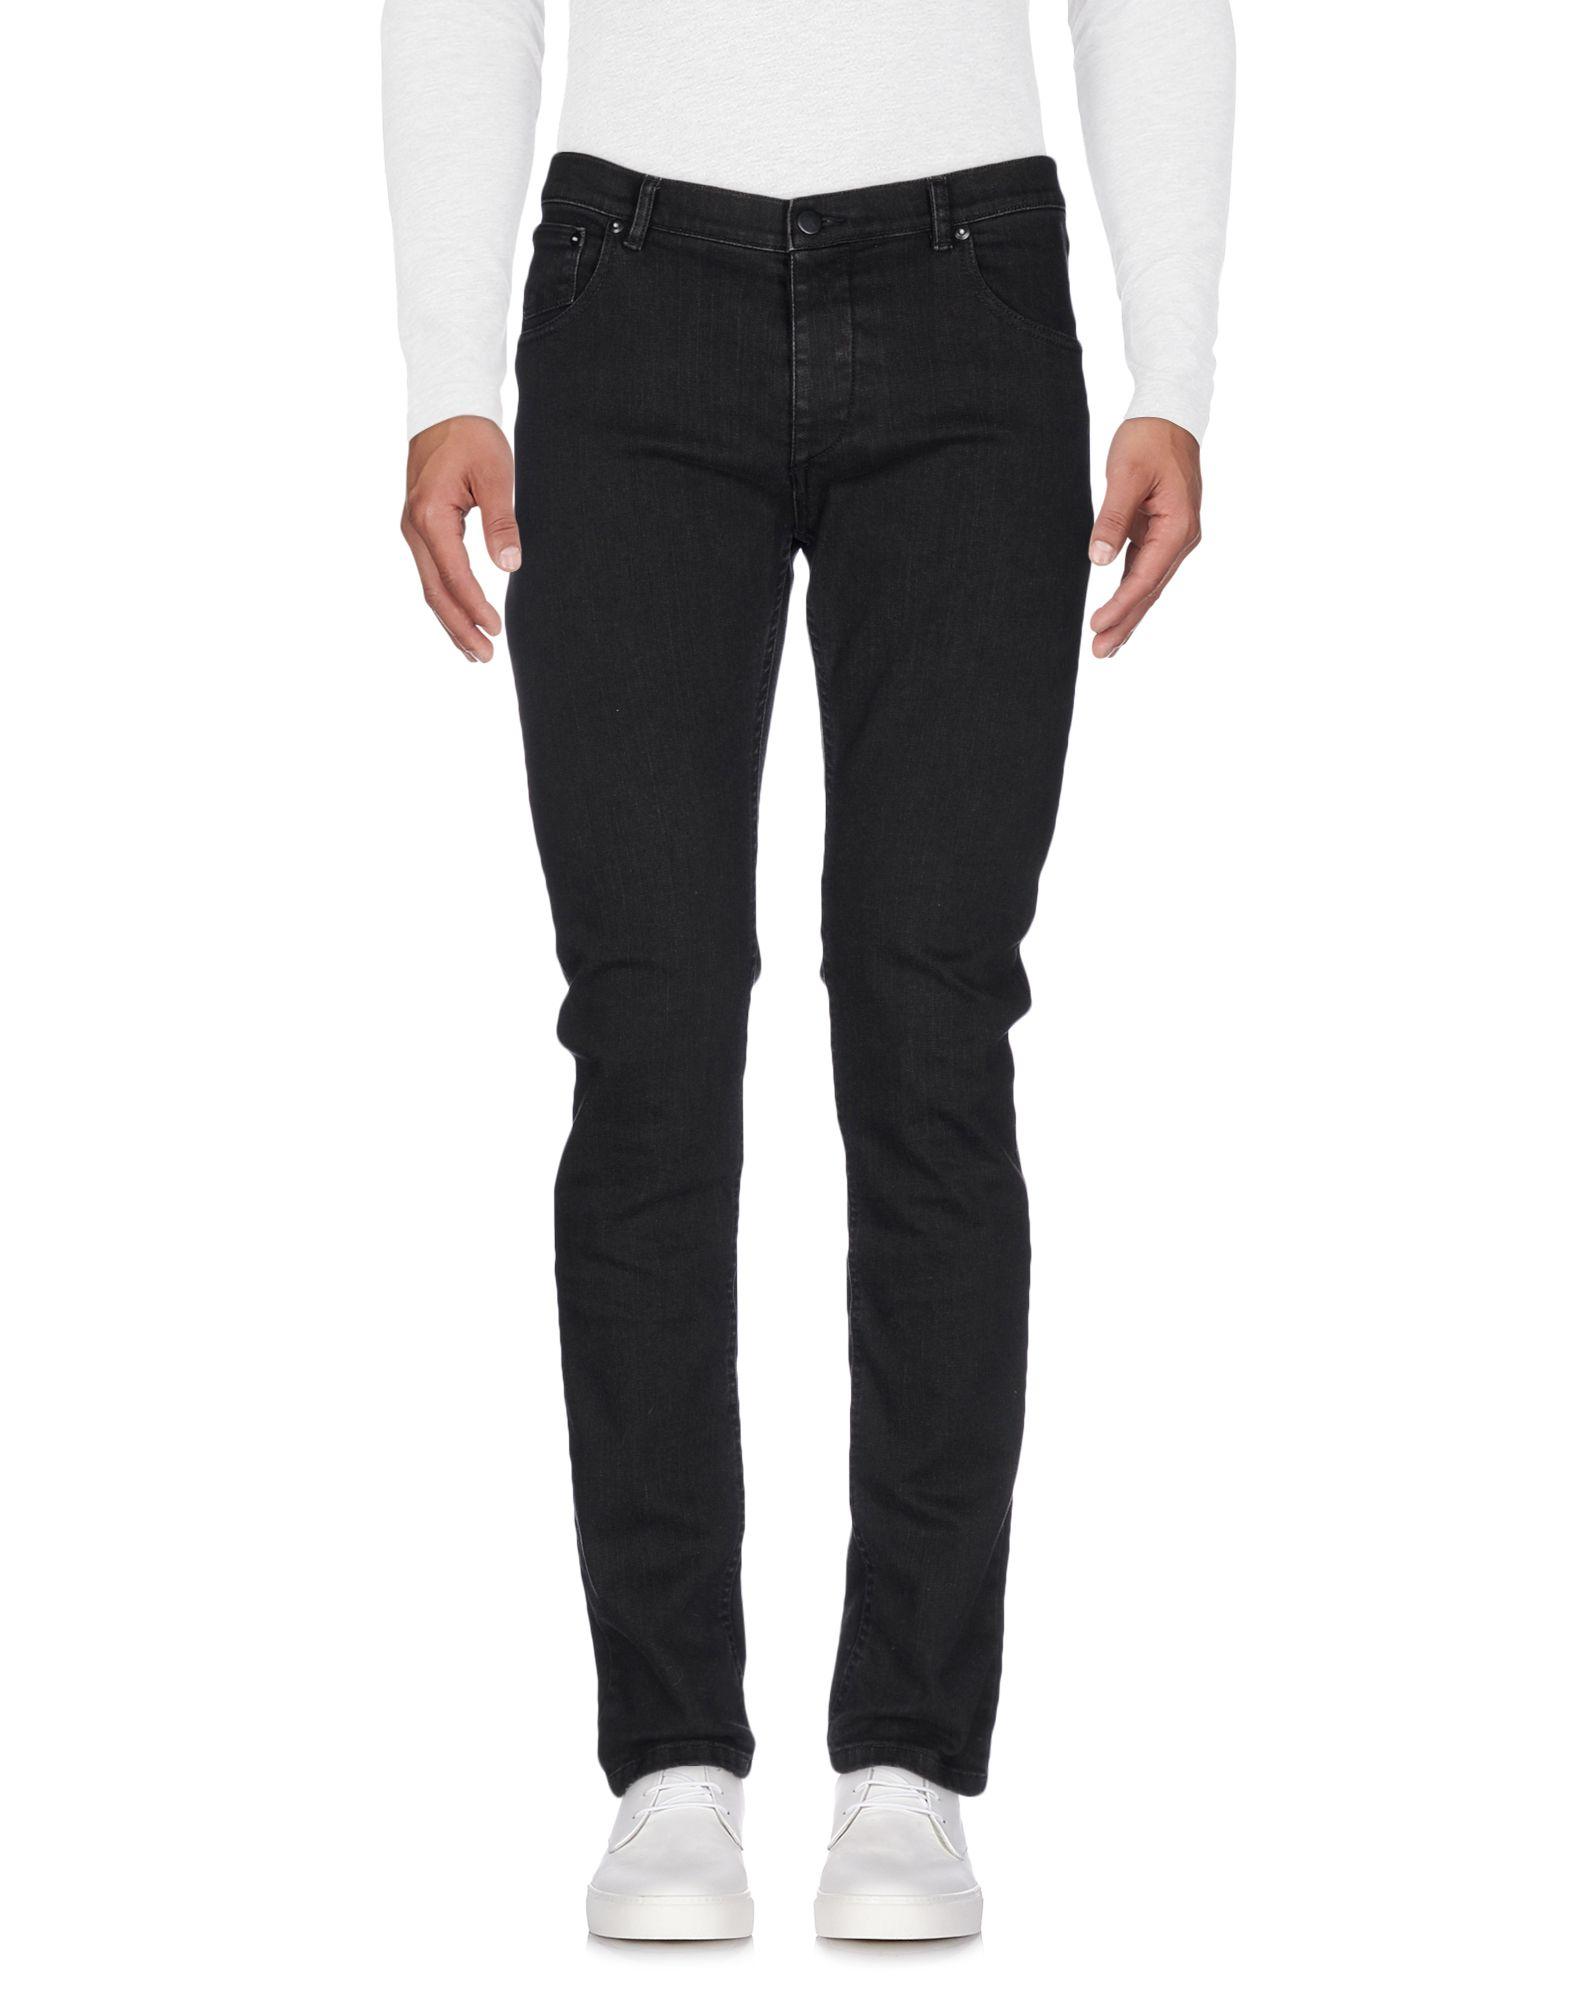 Pantaloni Jeans Gentryportofino Uomo - Acquista online su